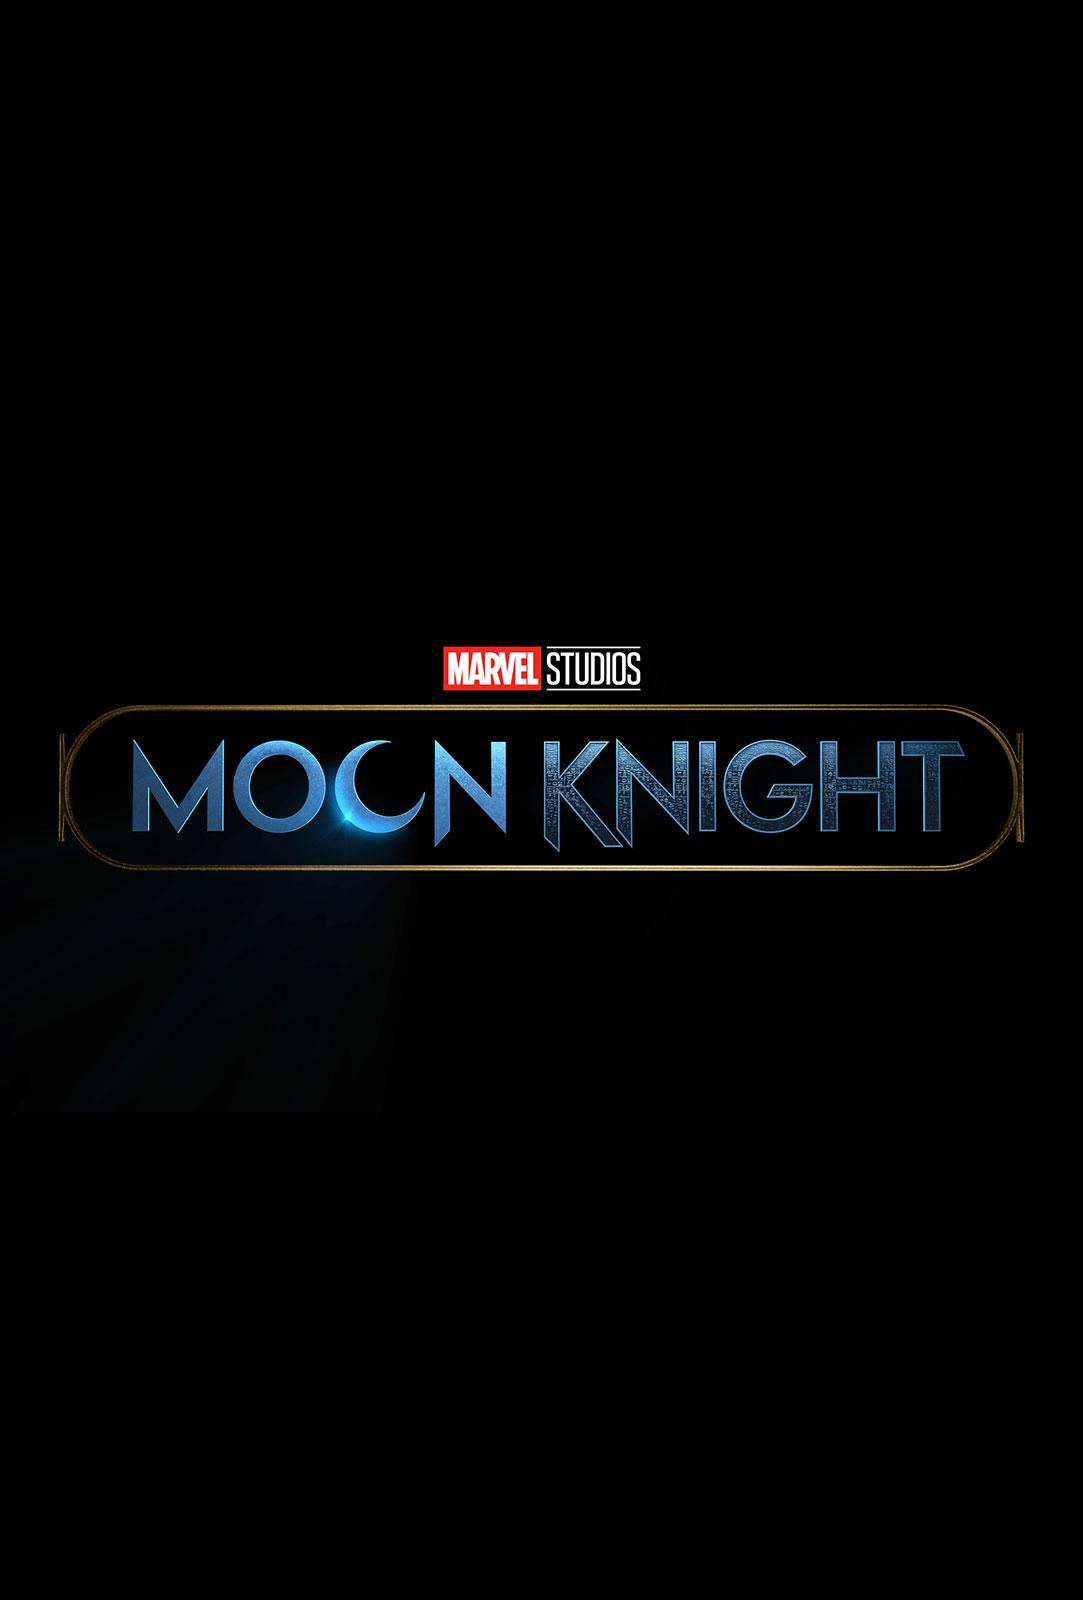 affiche poster moon knight disney marvel